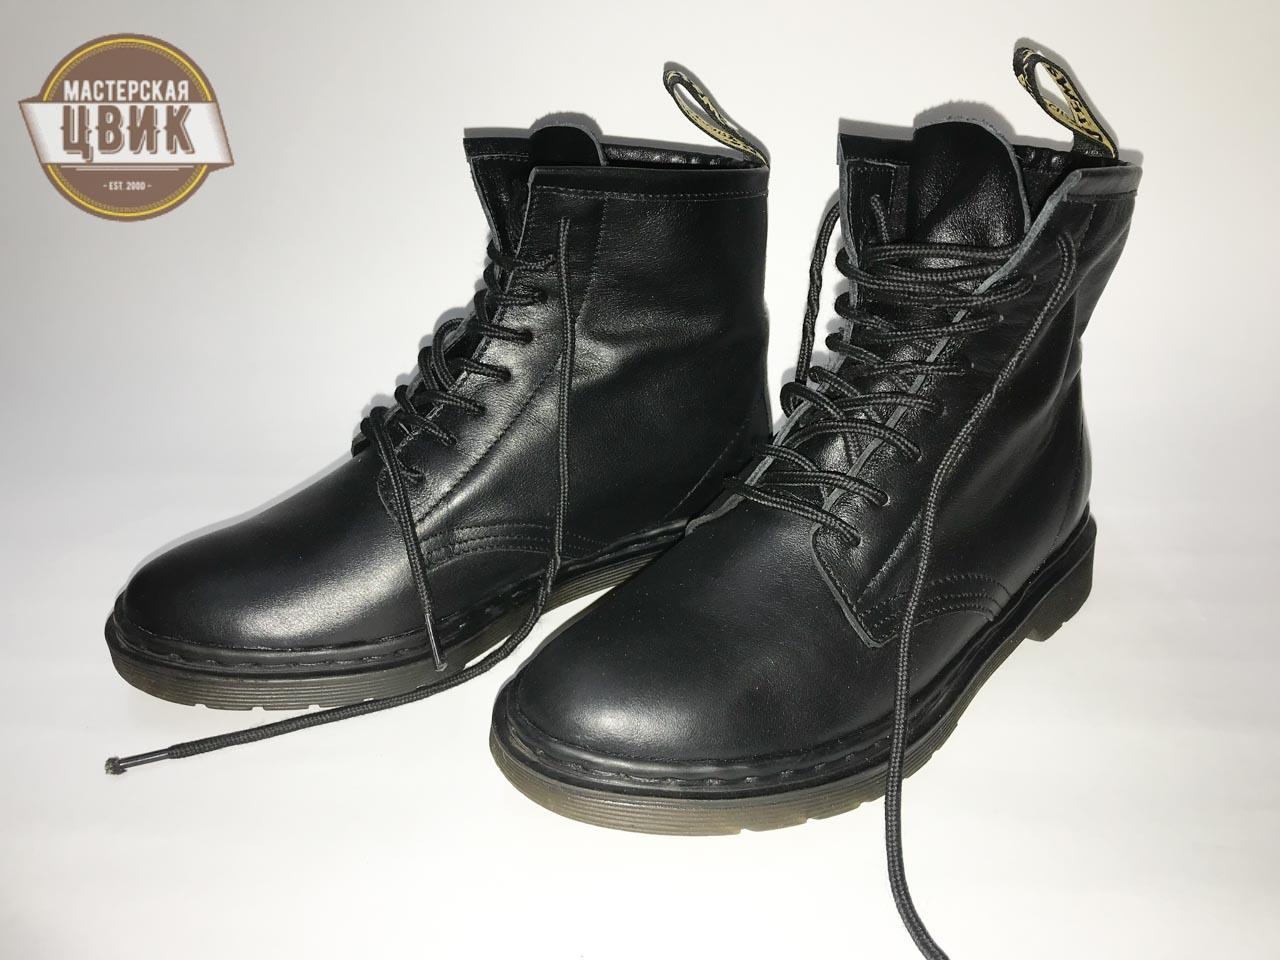 individualnyj-poshiv-obuvi-minsk-59 Индивидуальный пошив обуви